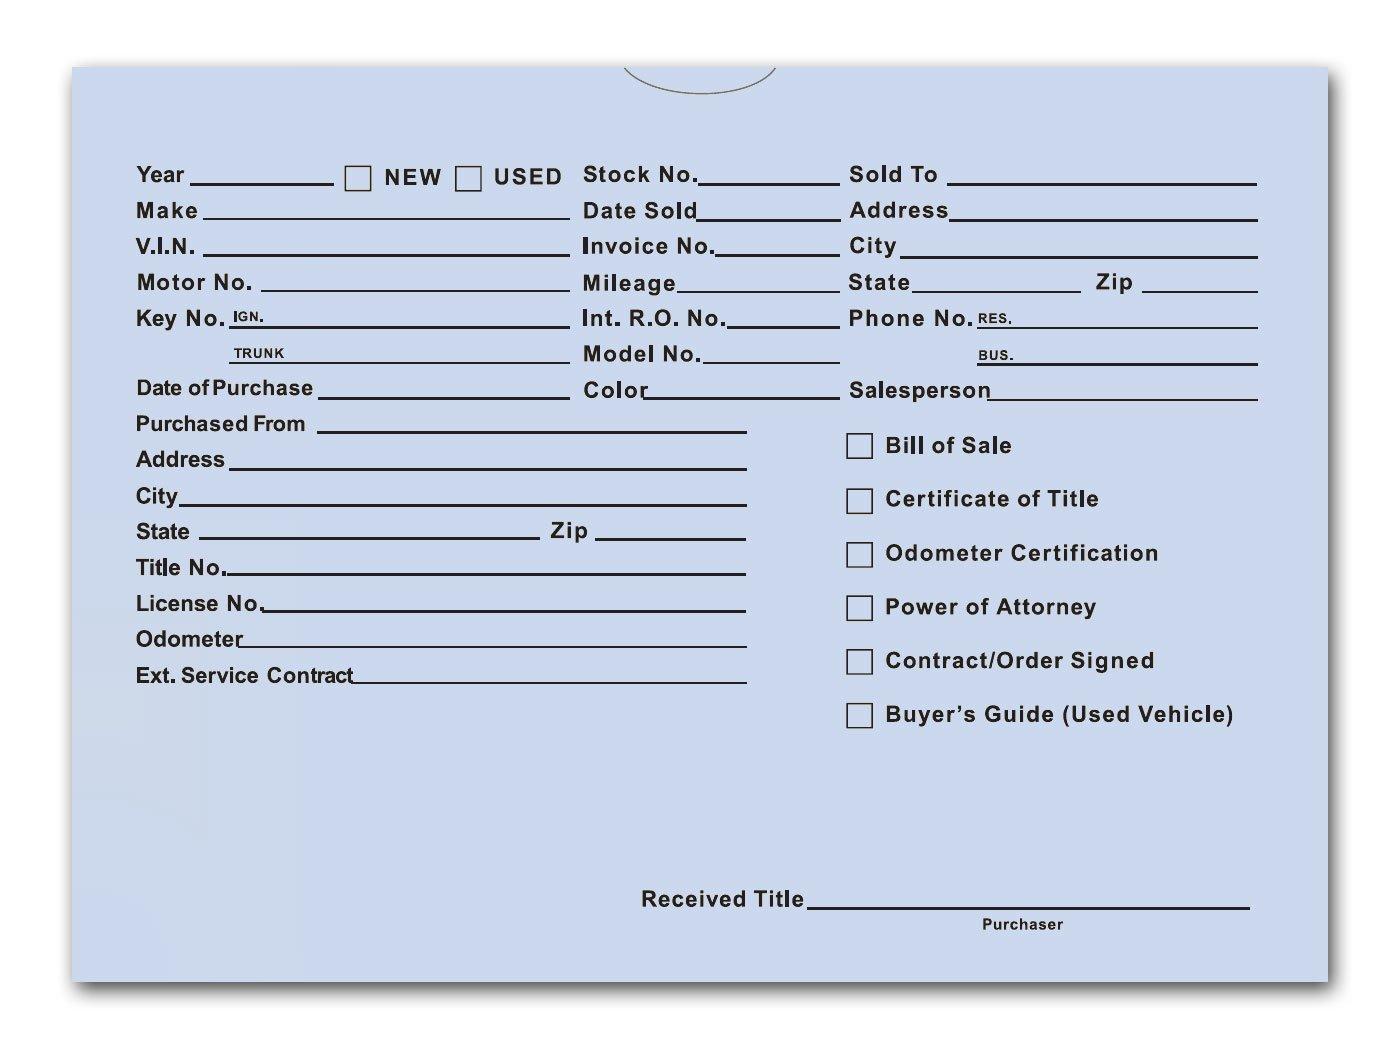 Printed Vehicle Deal Envelopes 9x12 Deal Jackets (100 shrink wrapped) (Blue)